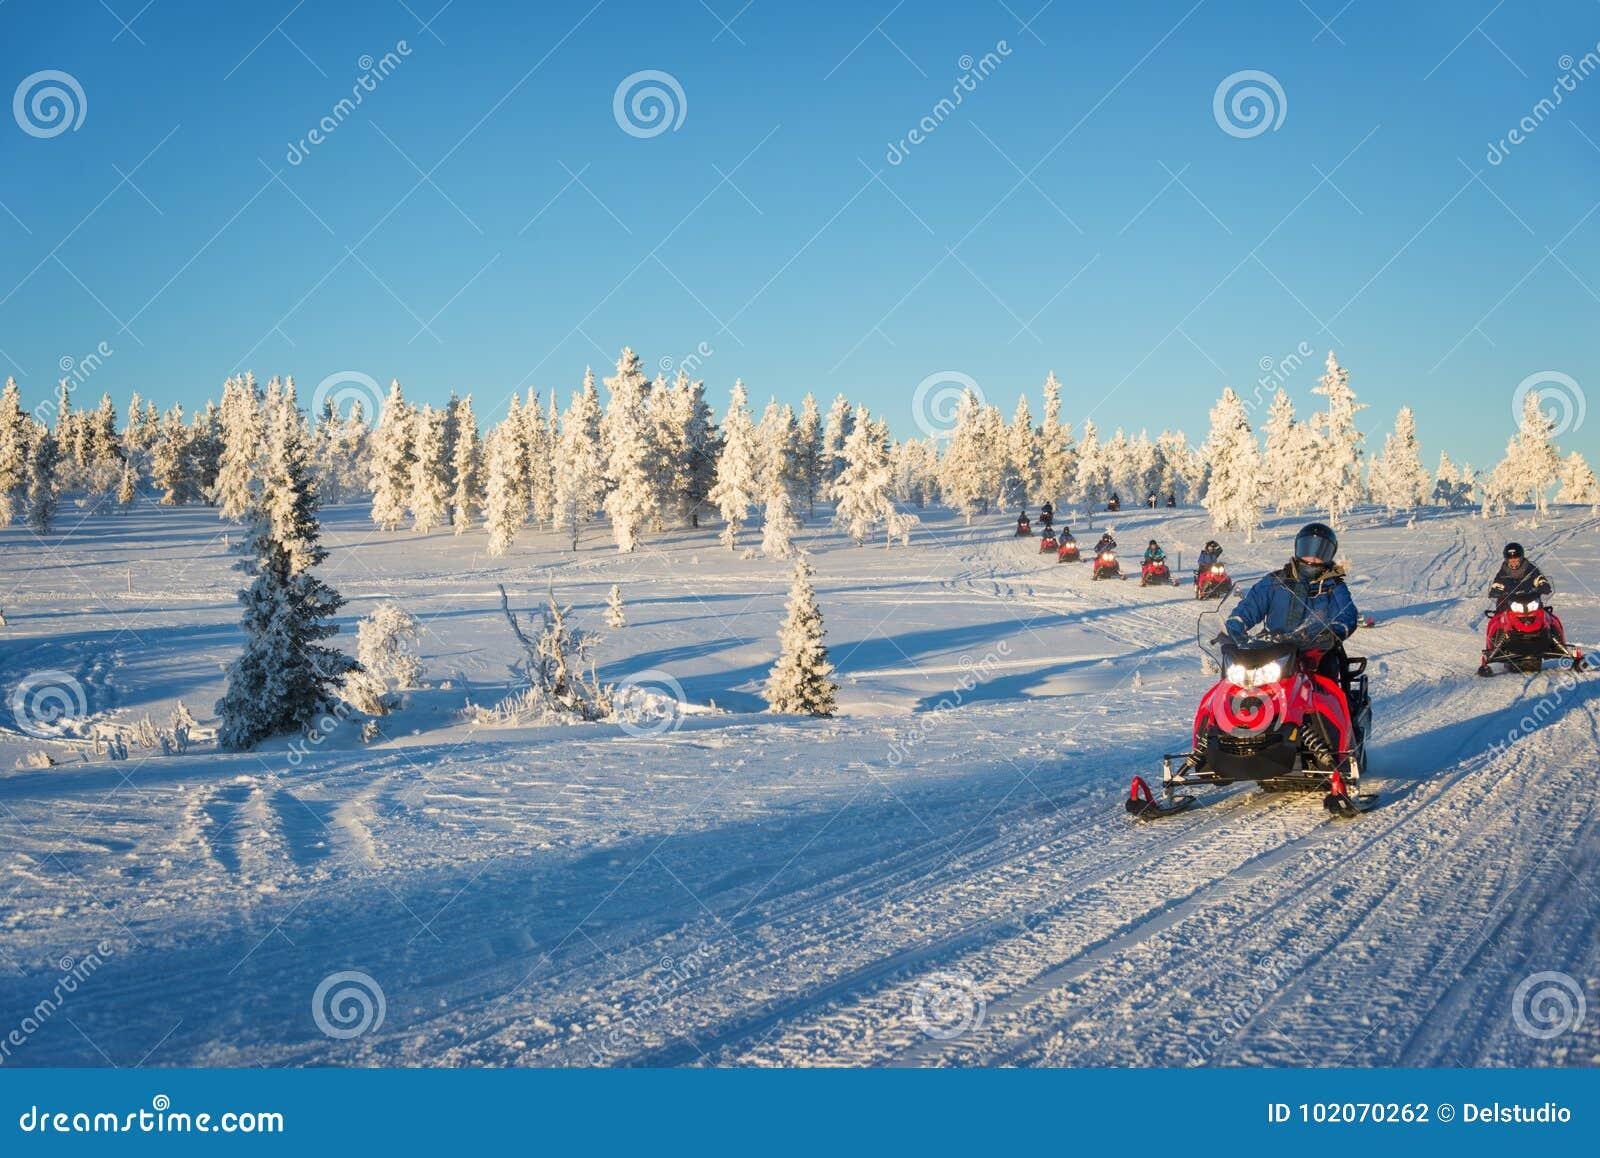 Groupe de motoneiges en Laponie, près de Saariselka Finlande